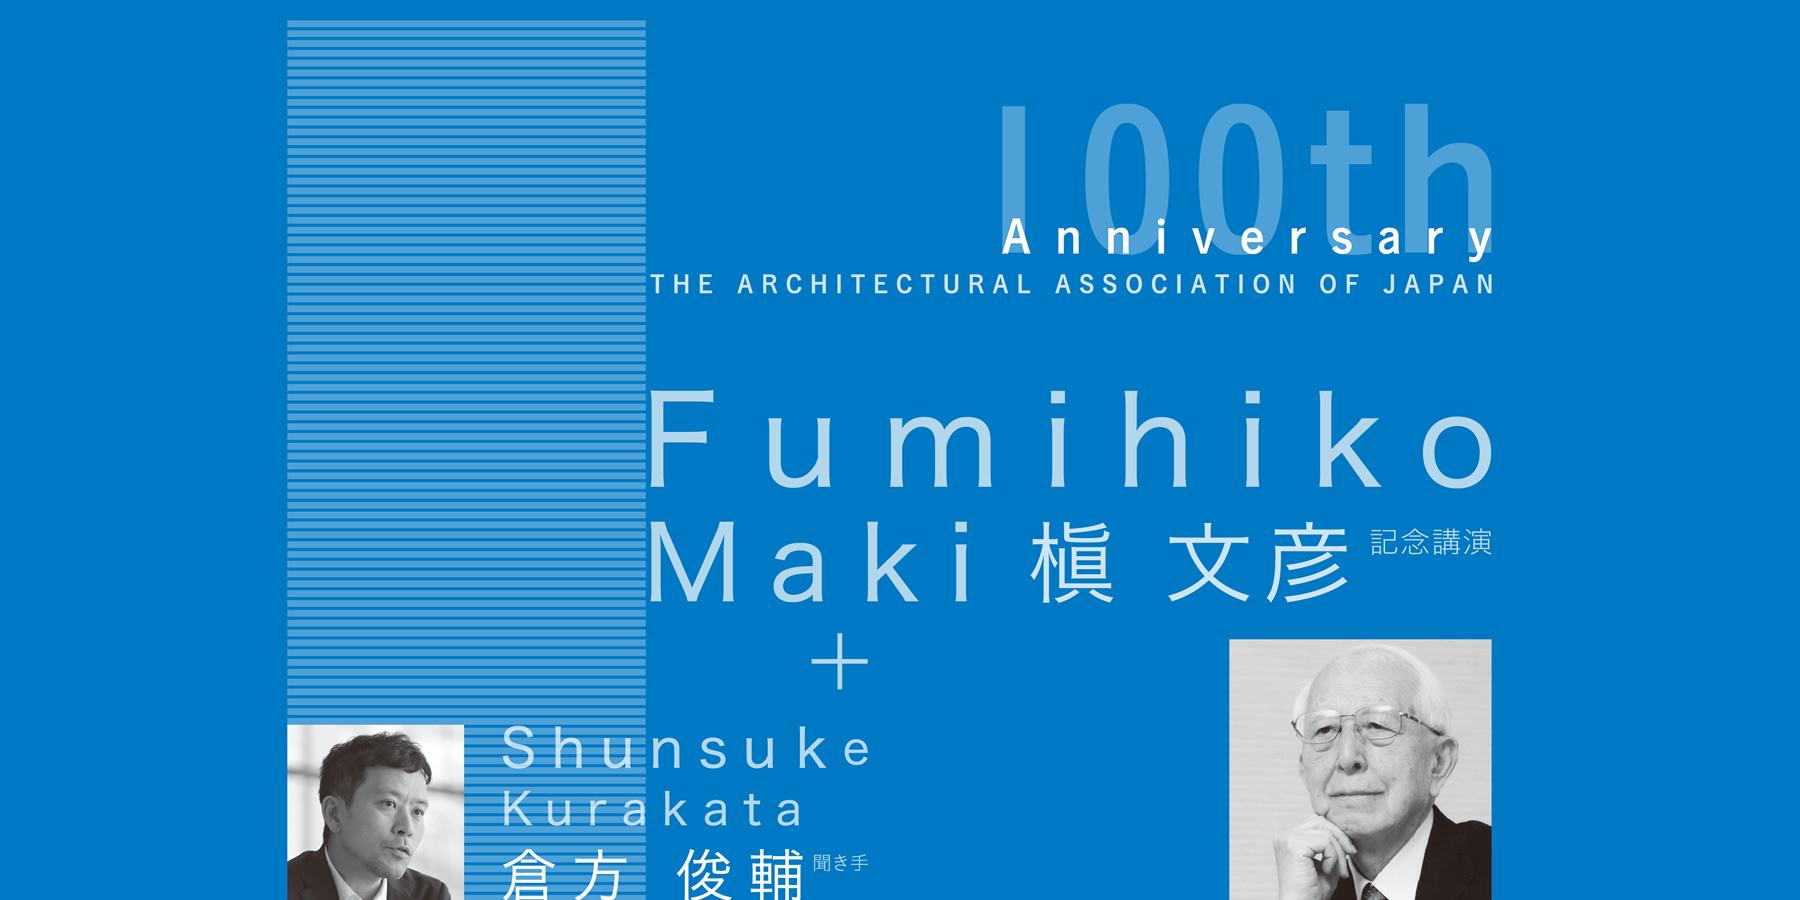 新しい地平へ 日本建築協会創立100周年記念事業